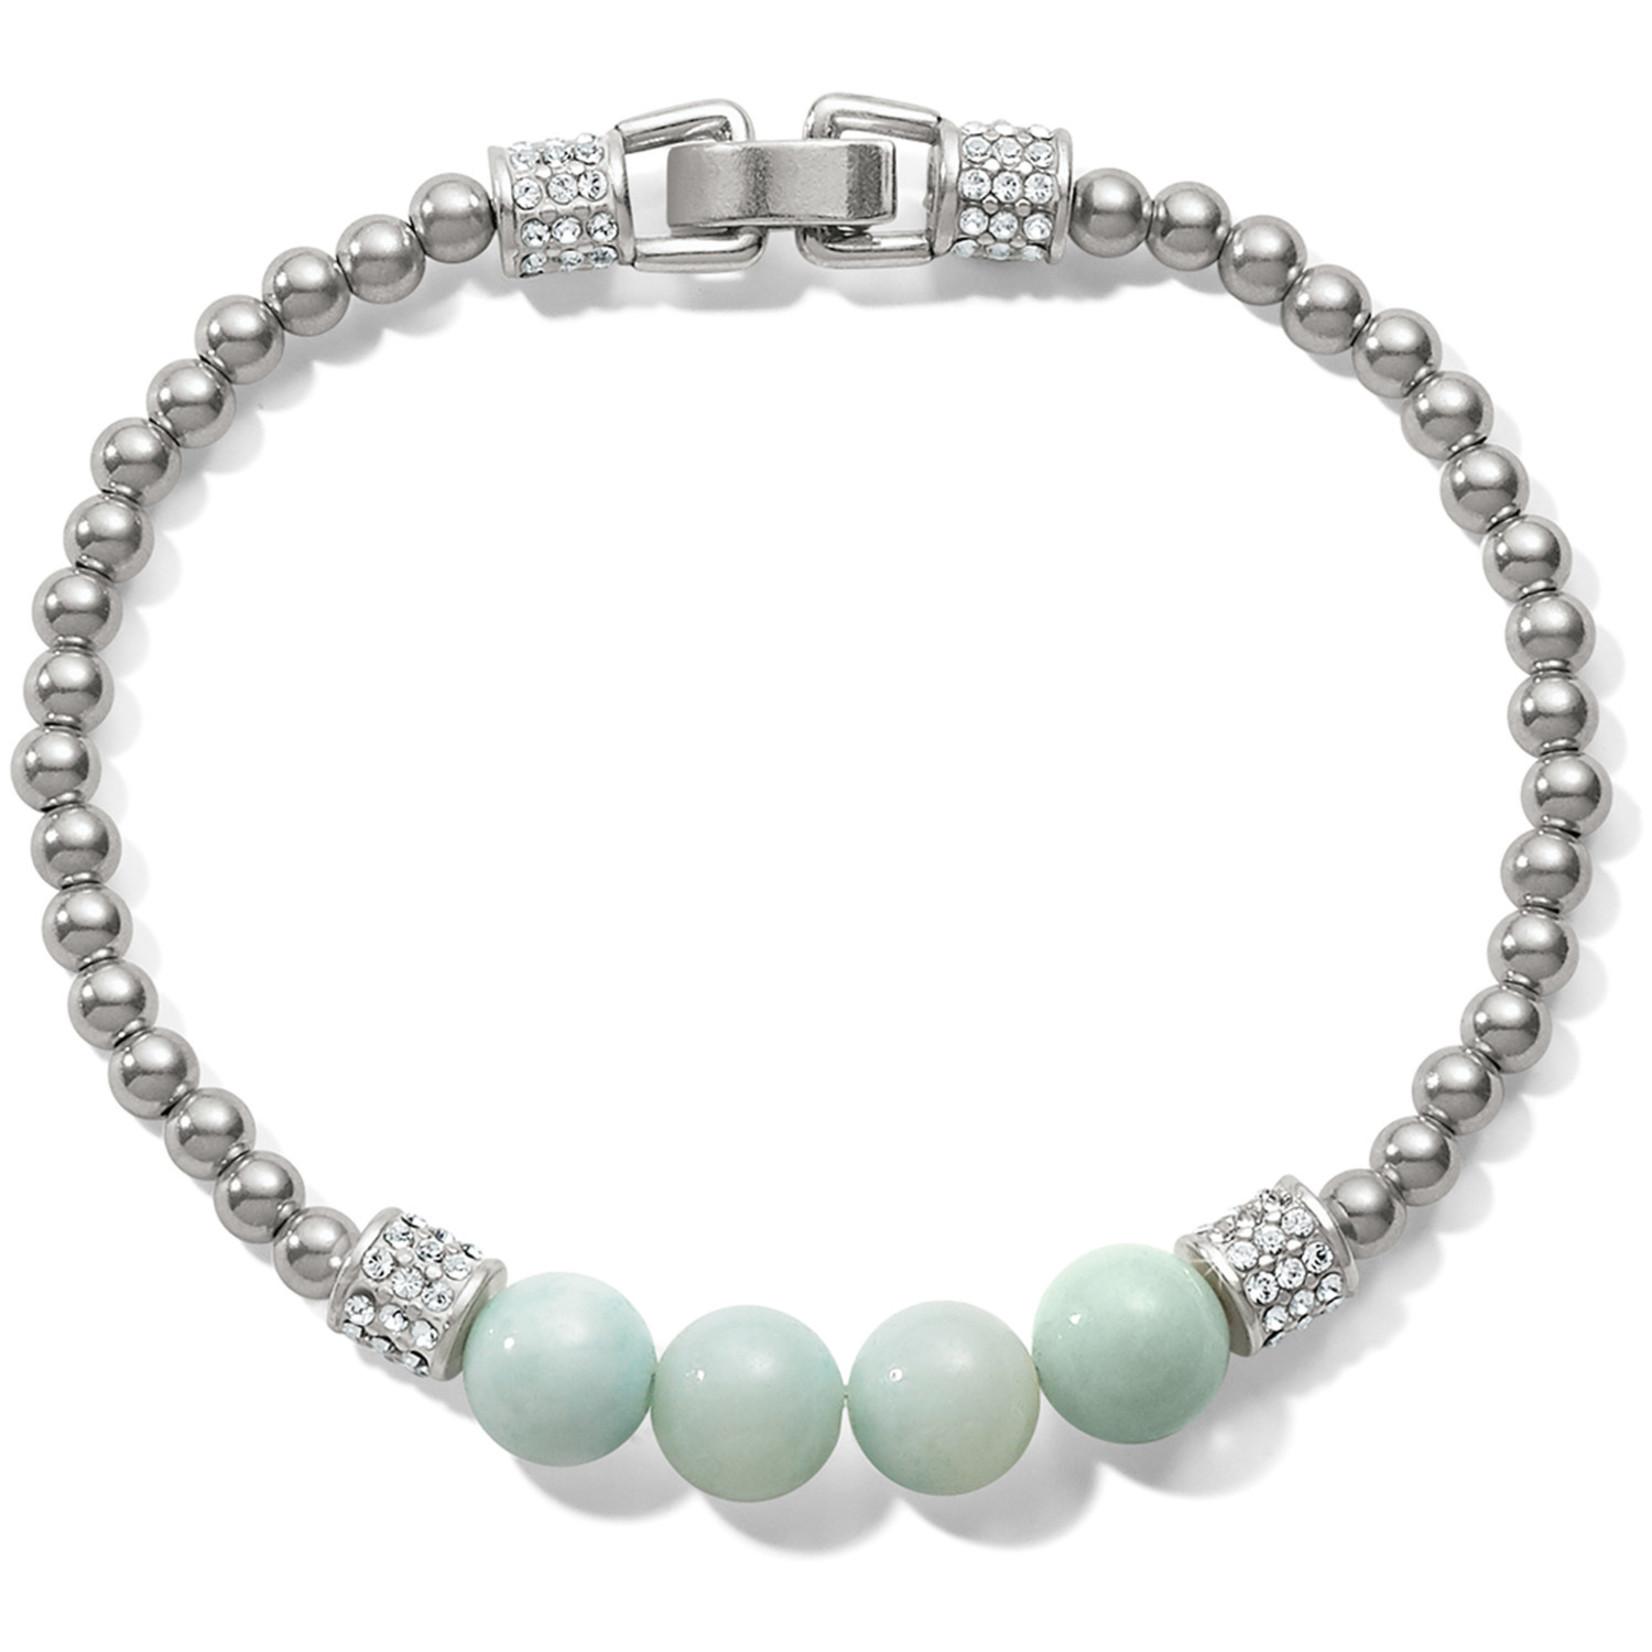 Brighton Meridian Petite Prime Bracelet Silver-Light Blue